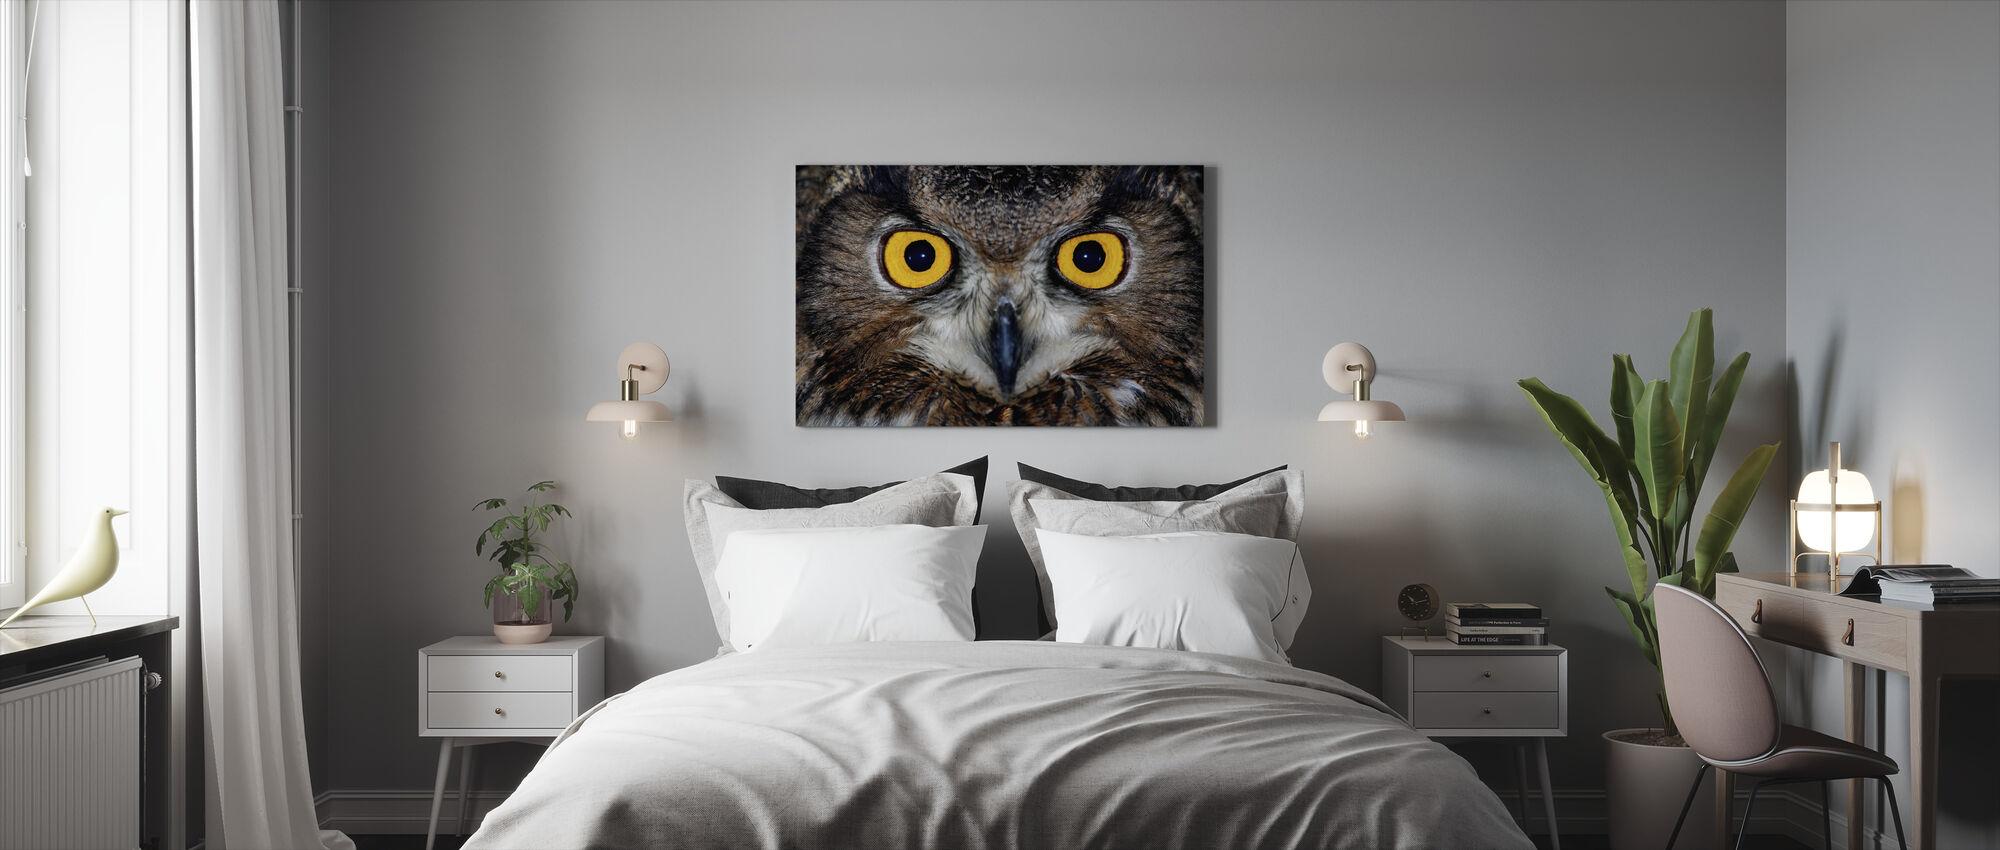 Eagle Owl Eyes - Canvas print - Bedroom